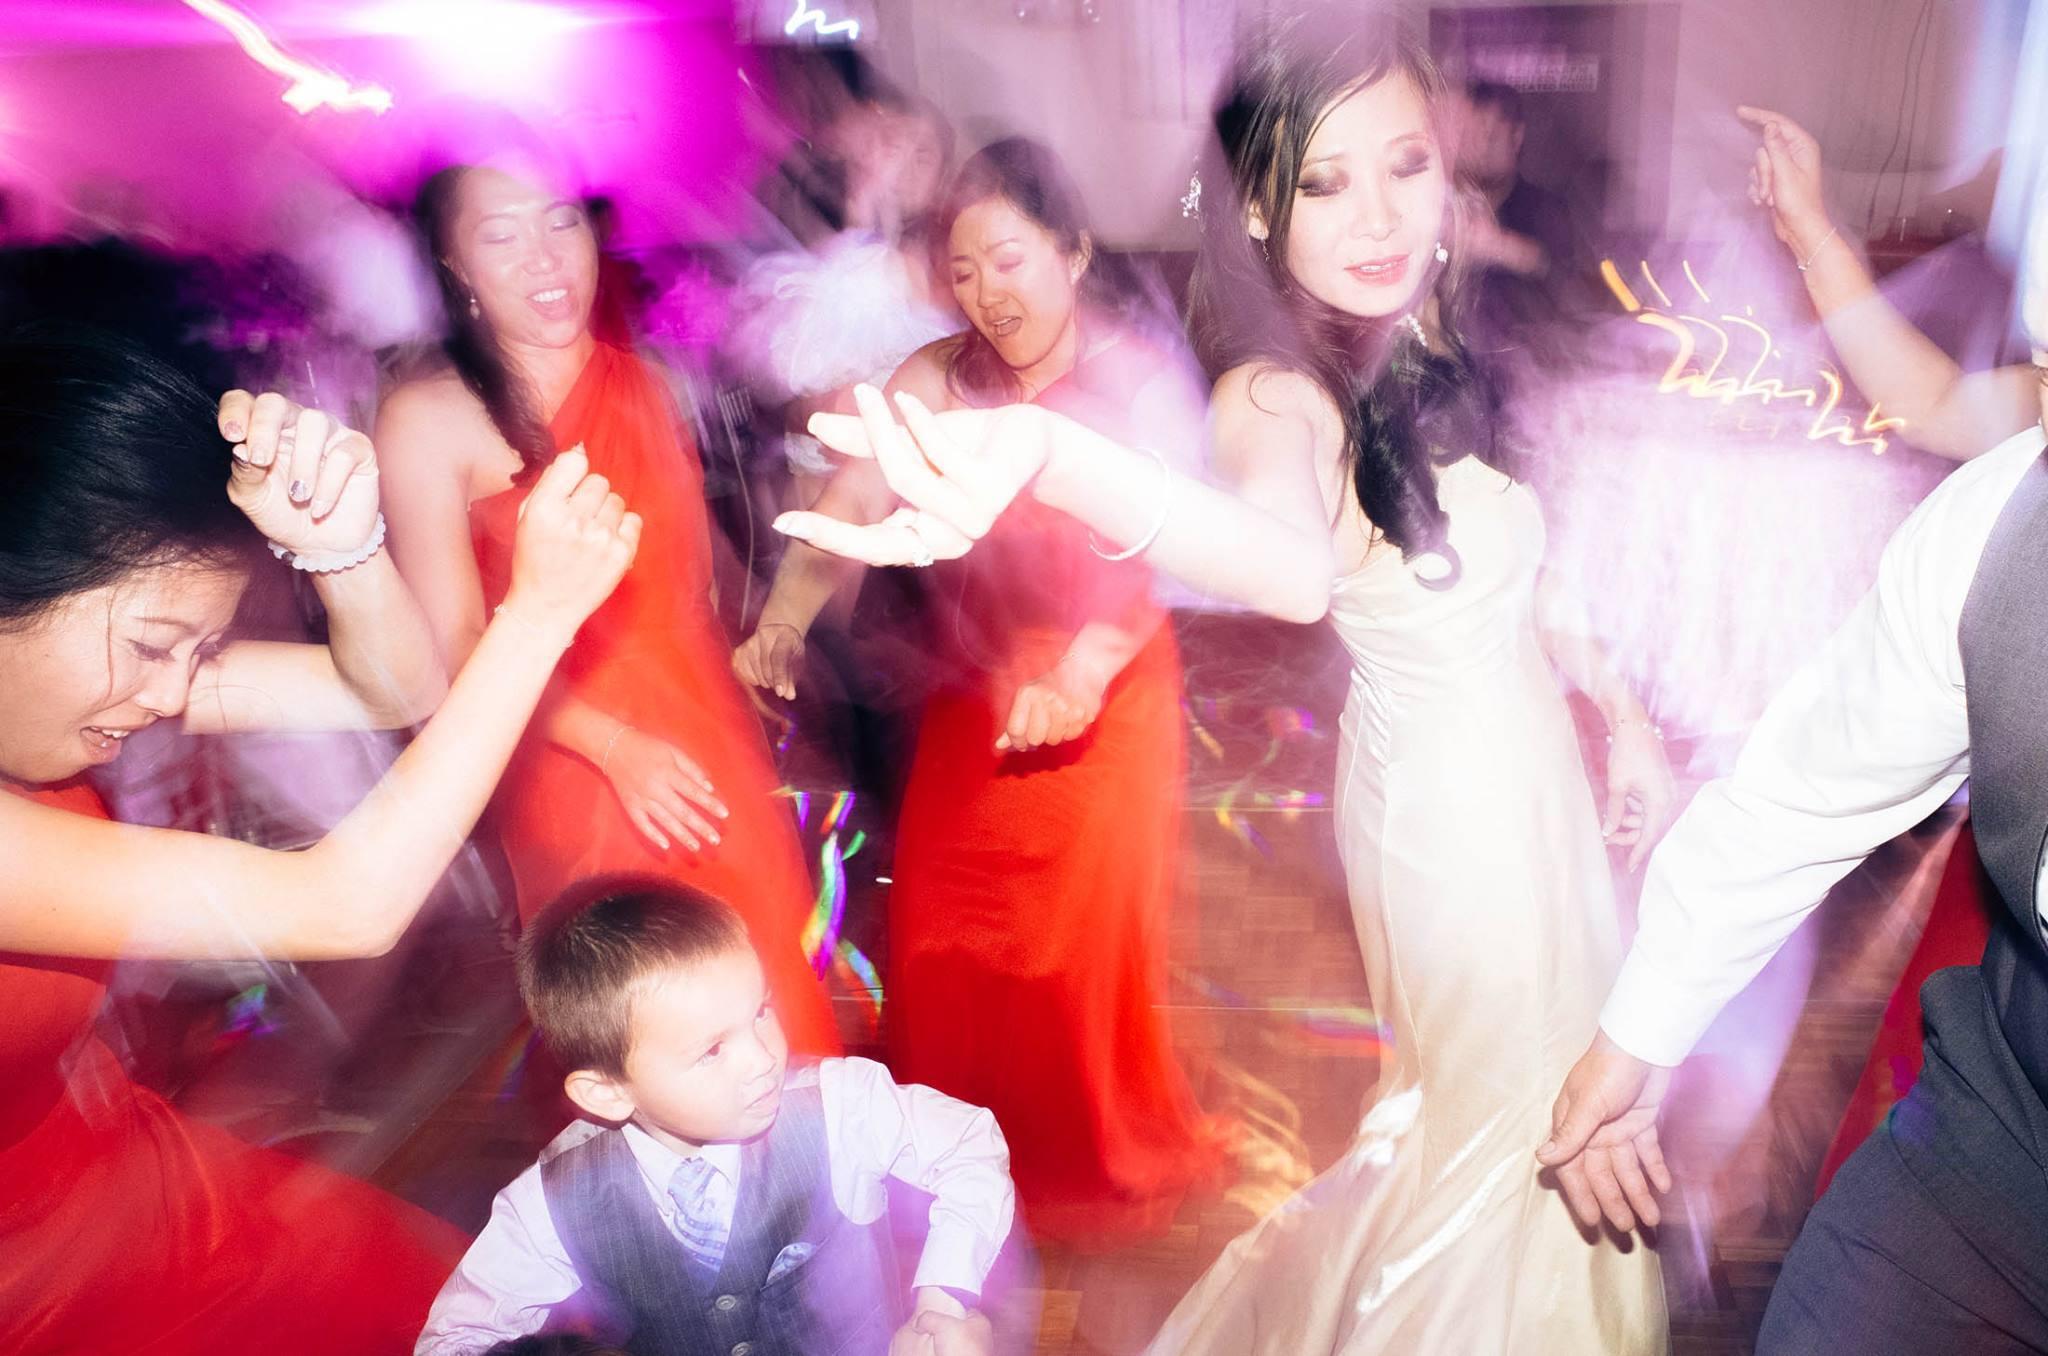 KennyJCStudio - Wedding Day Photography01.jpg